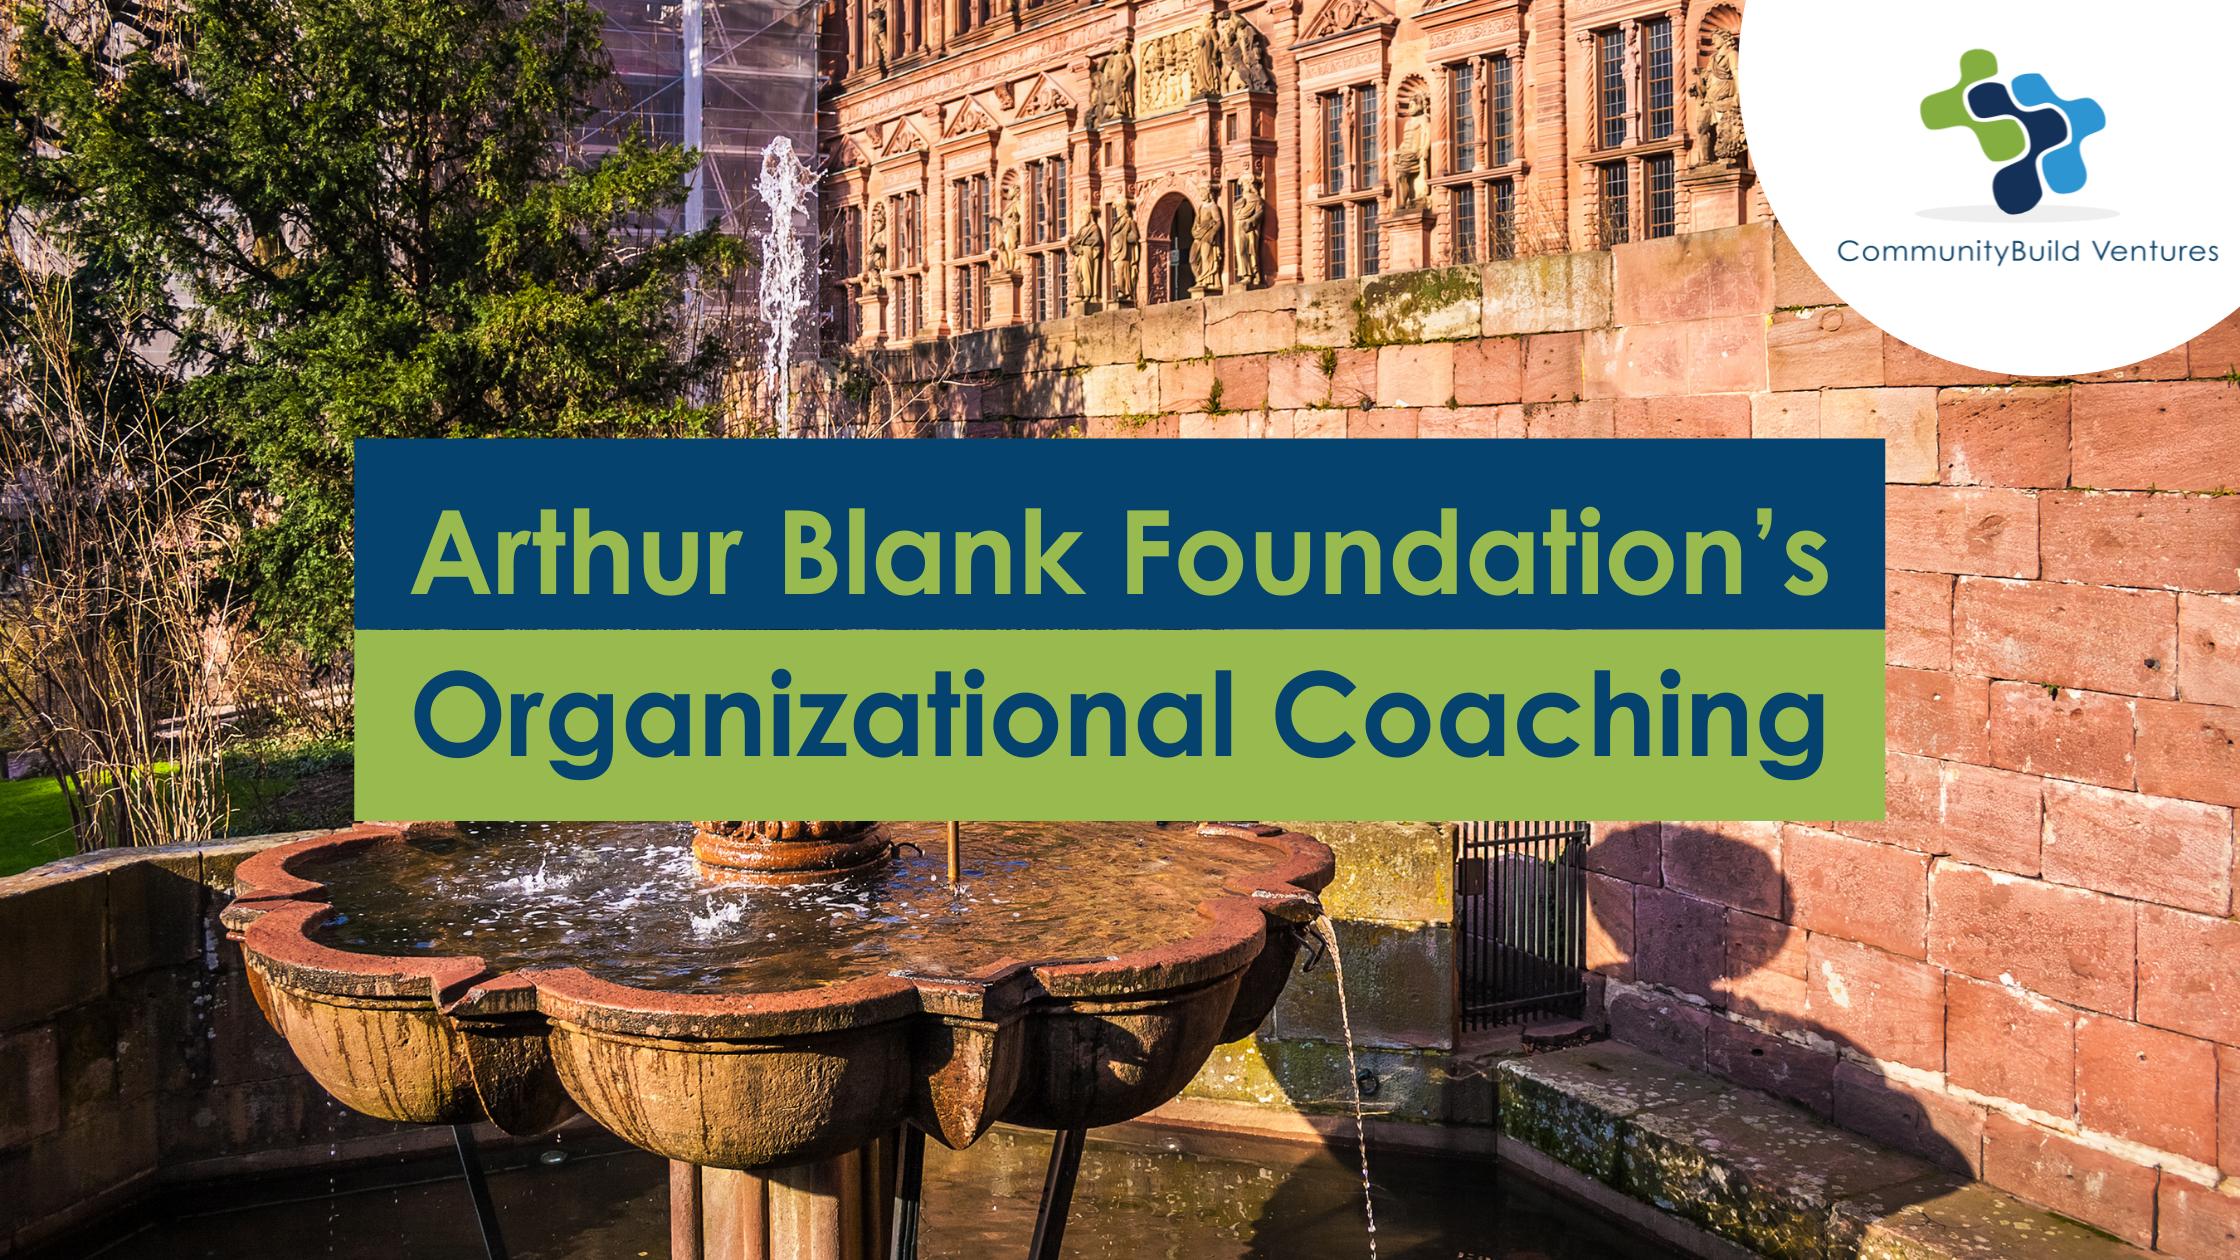 Arthur Blank Foundation's Organizational Coaching